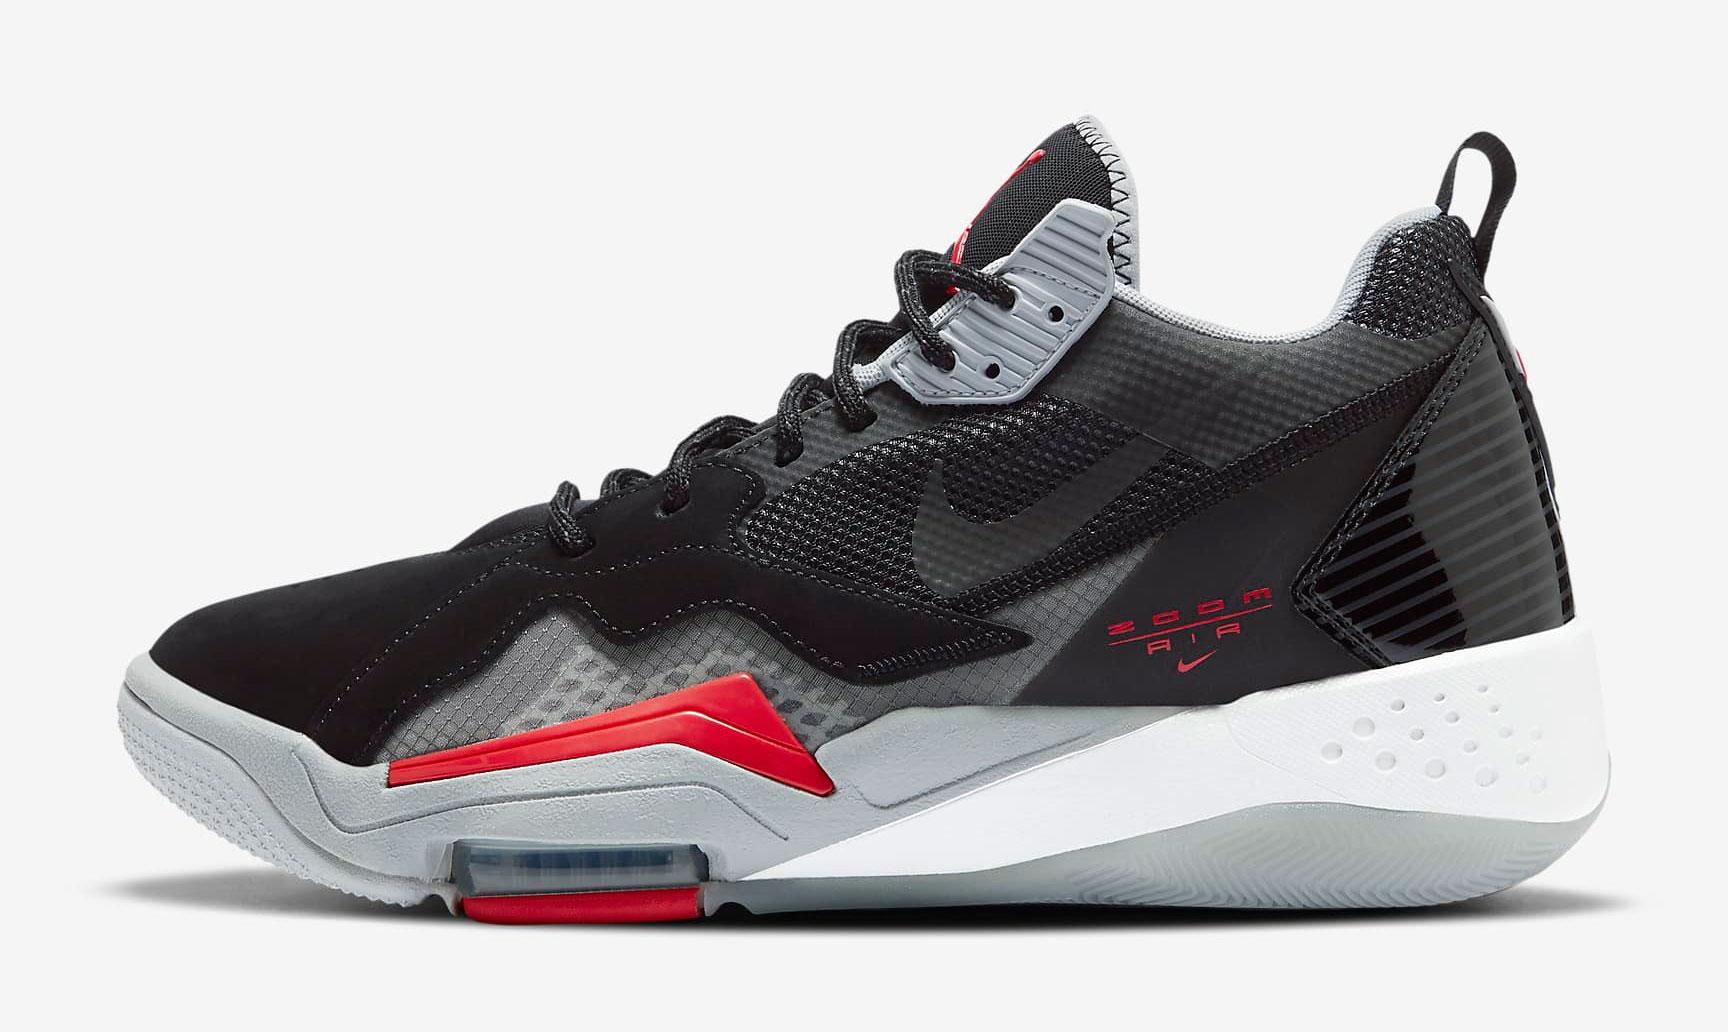 jordan-zoom-92-black-red-bred-cement-release-date